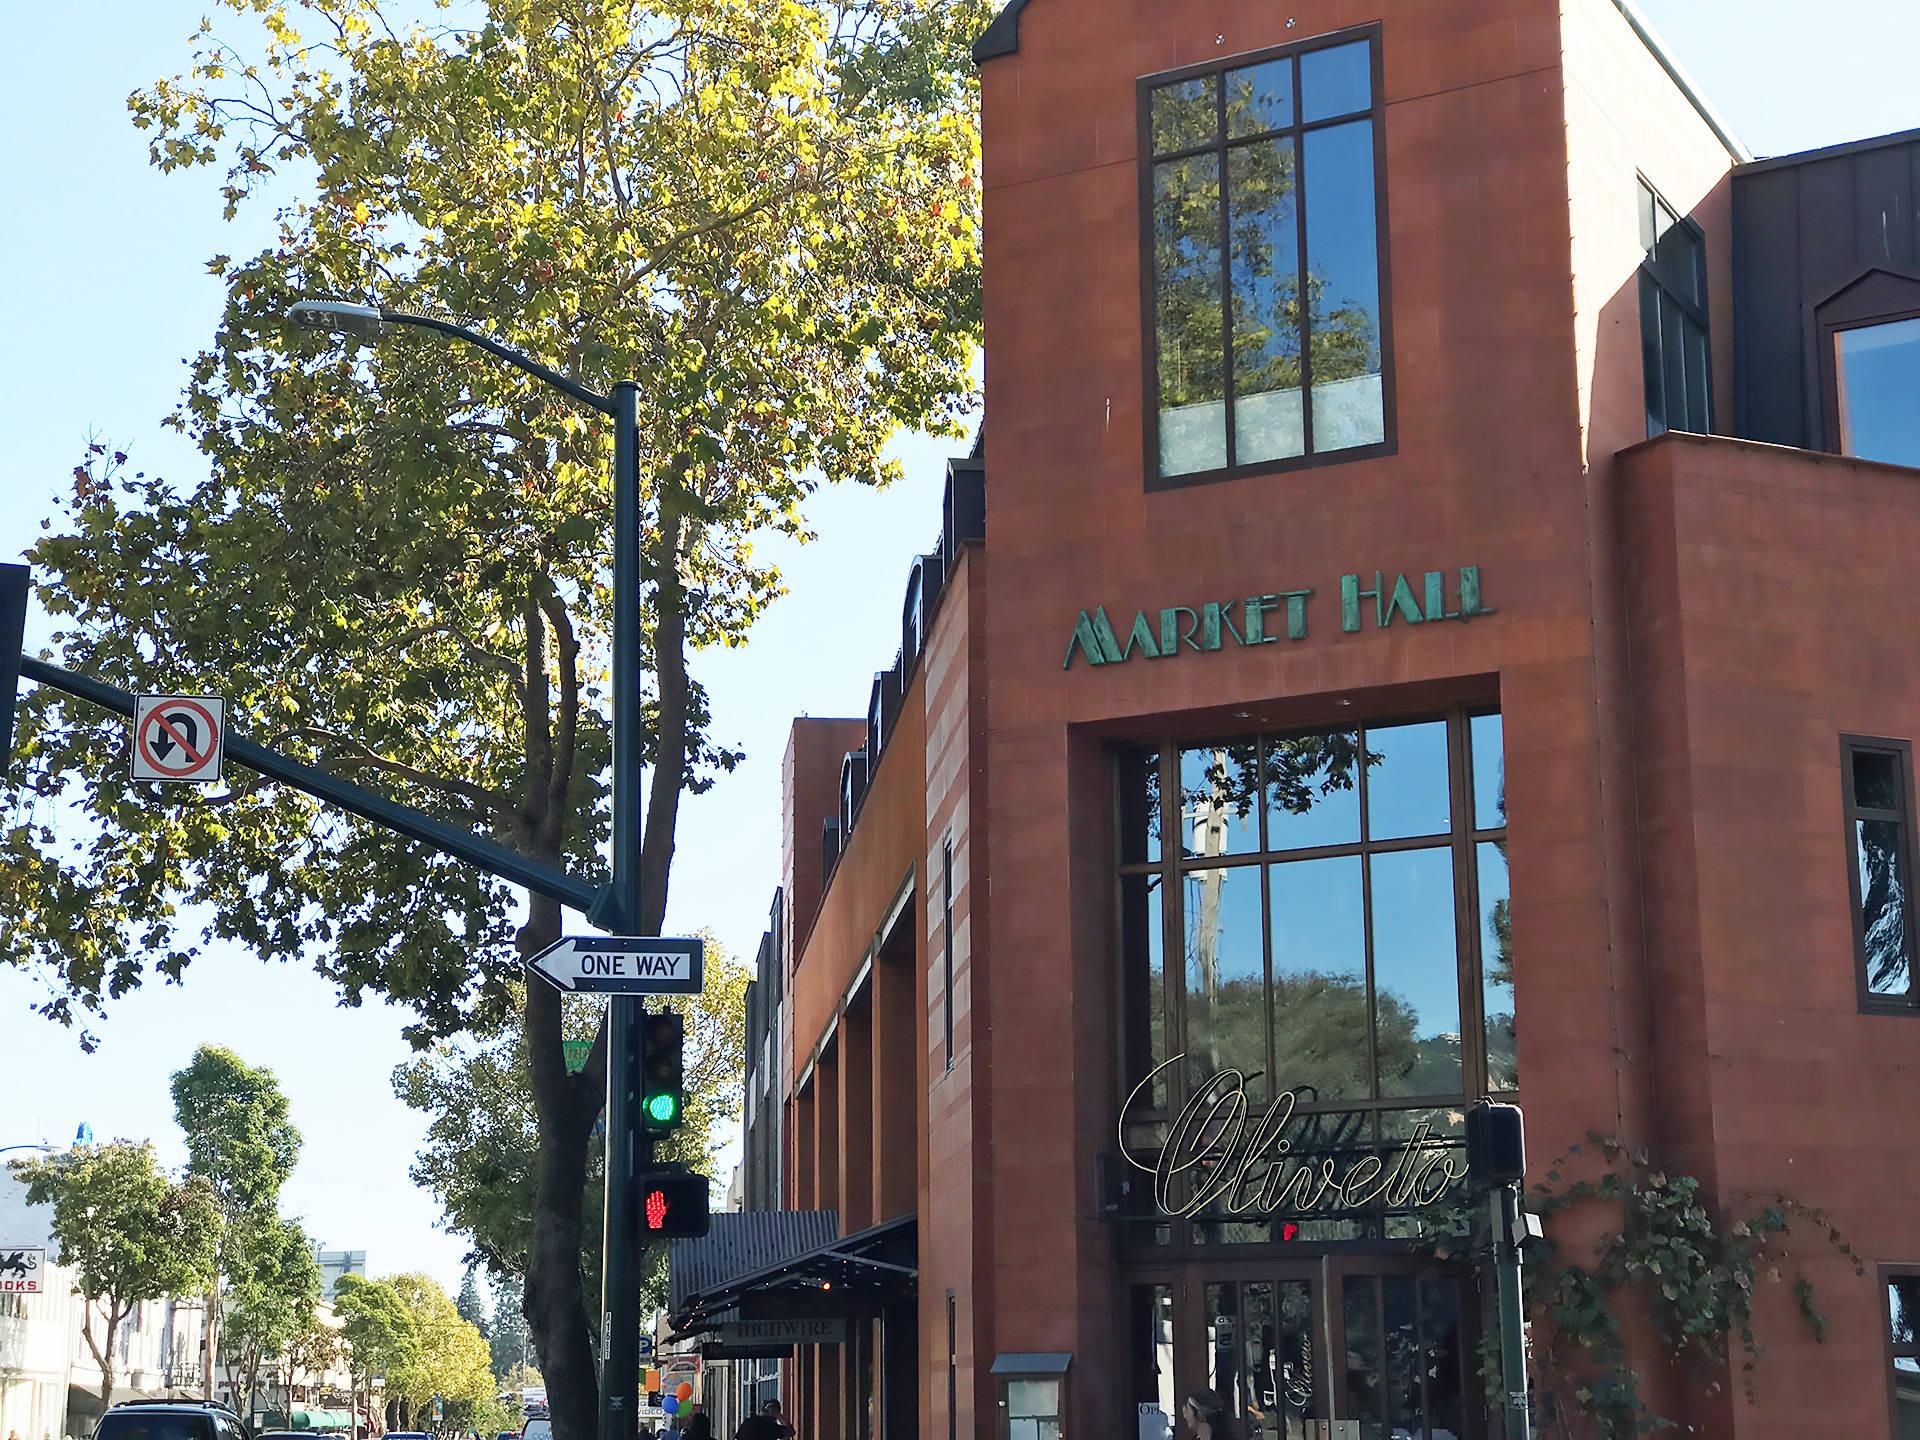 Exterior of Rockridge Market Hall on College Ave. in Oakland Kim Westerman